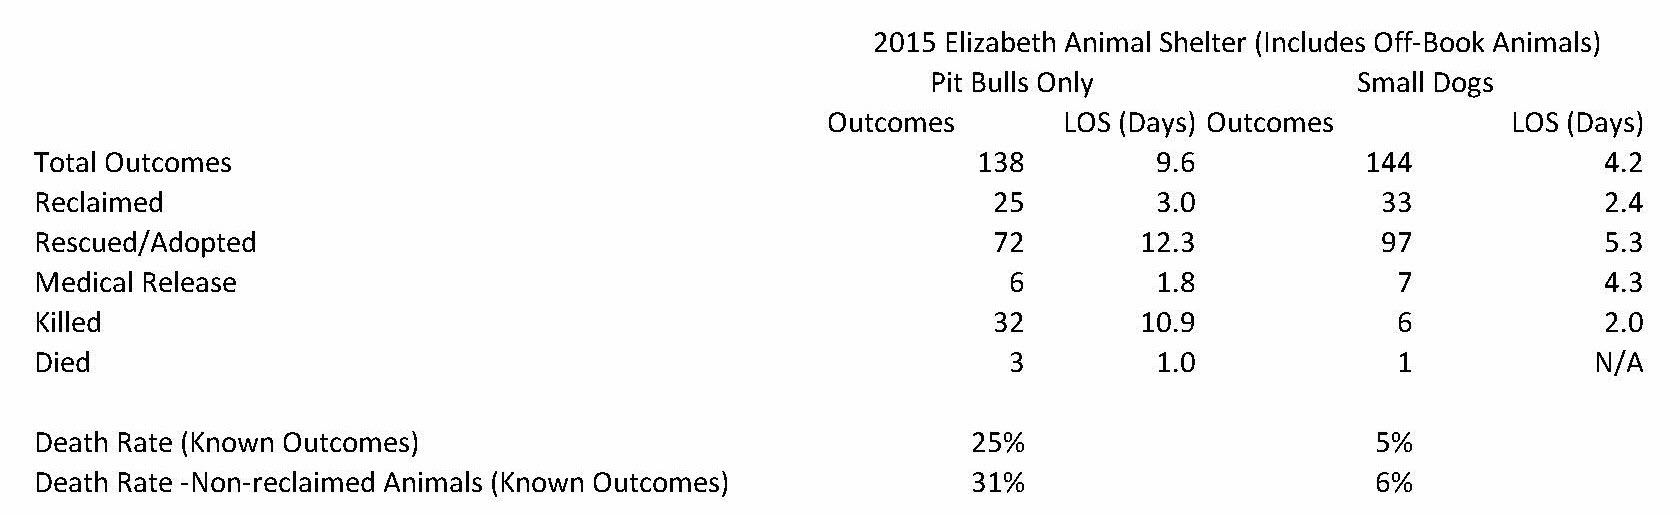 Elizabeth Animal Shelter 2015 Statistics (24)